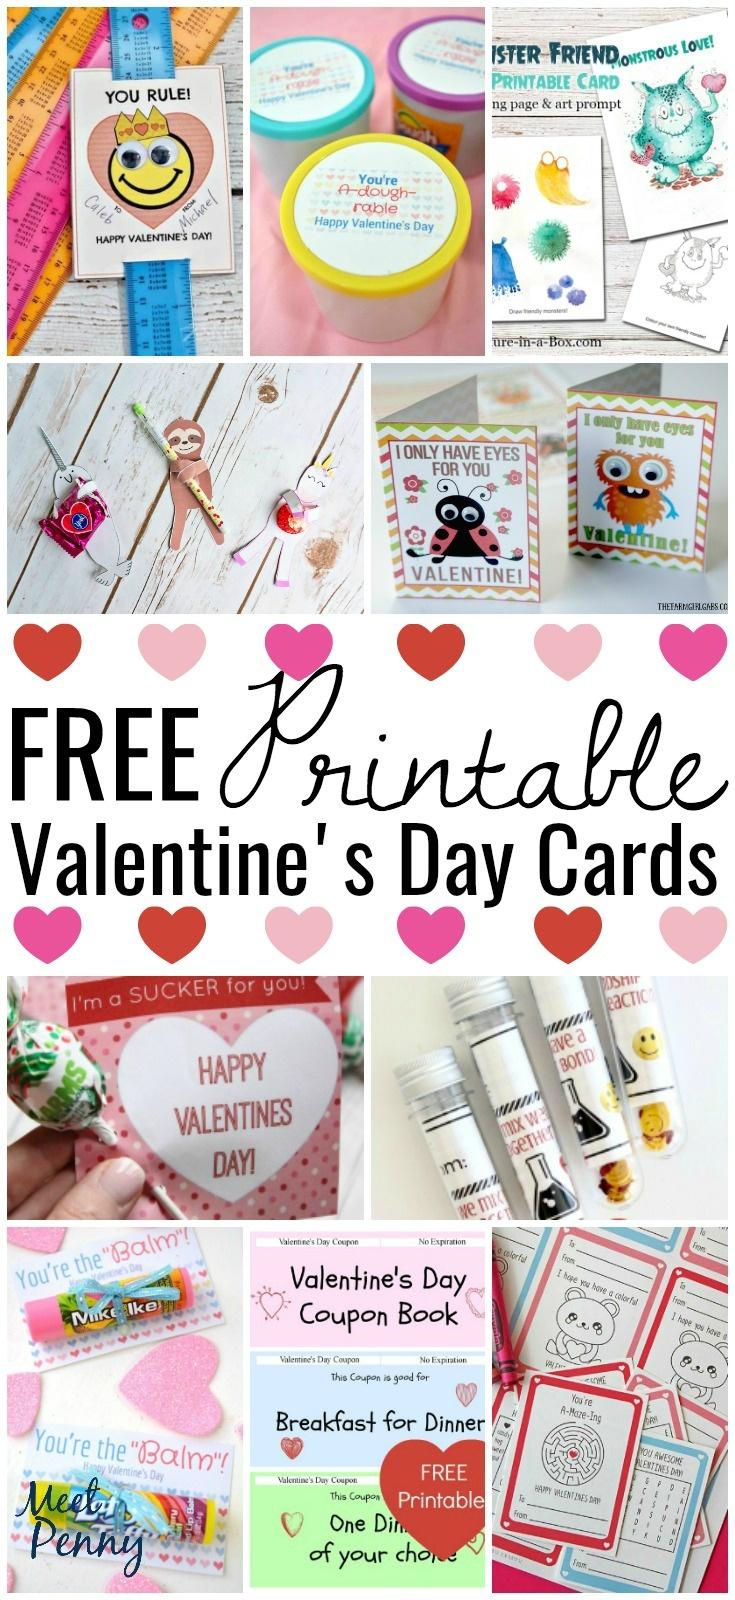 Free Printable Valentines Cards - Meet Penny - Free Printable School Valentines Cards